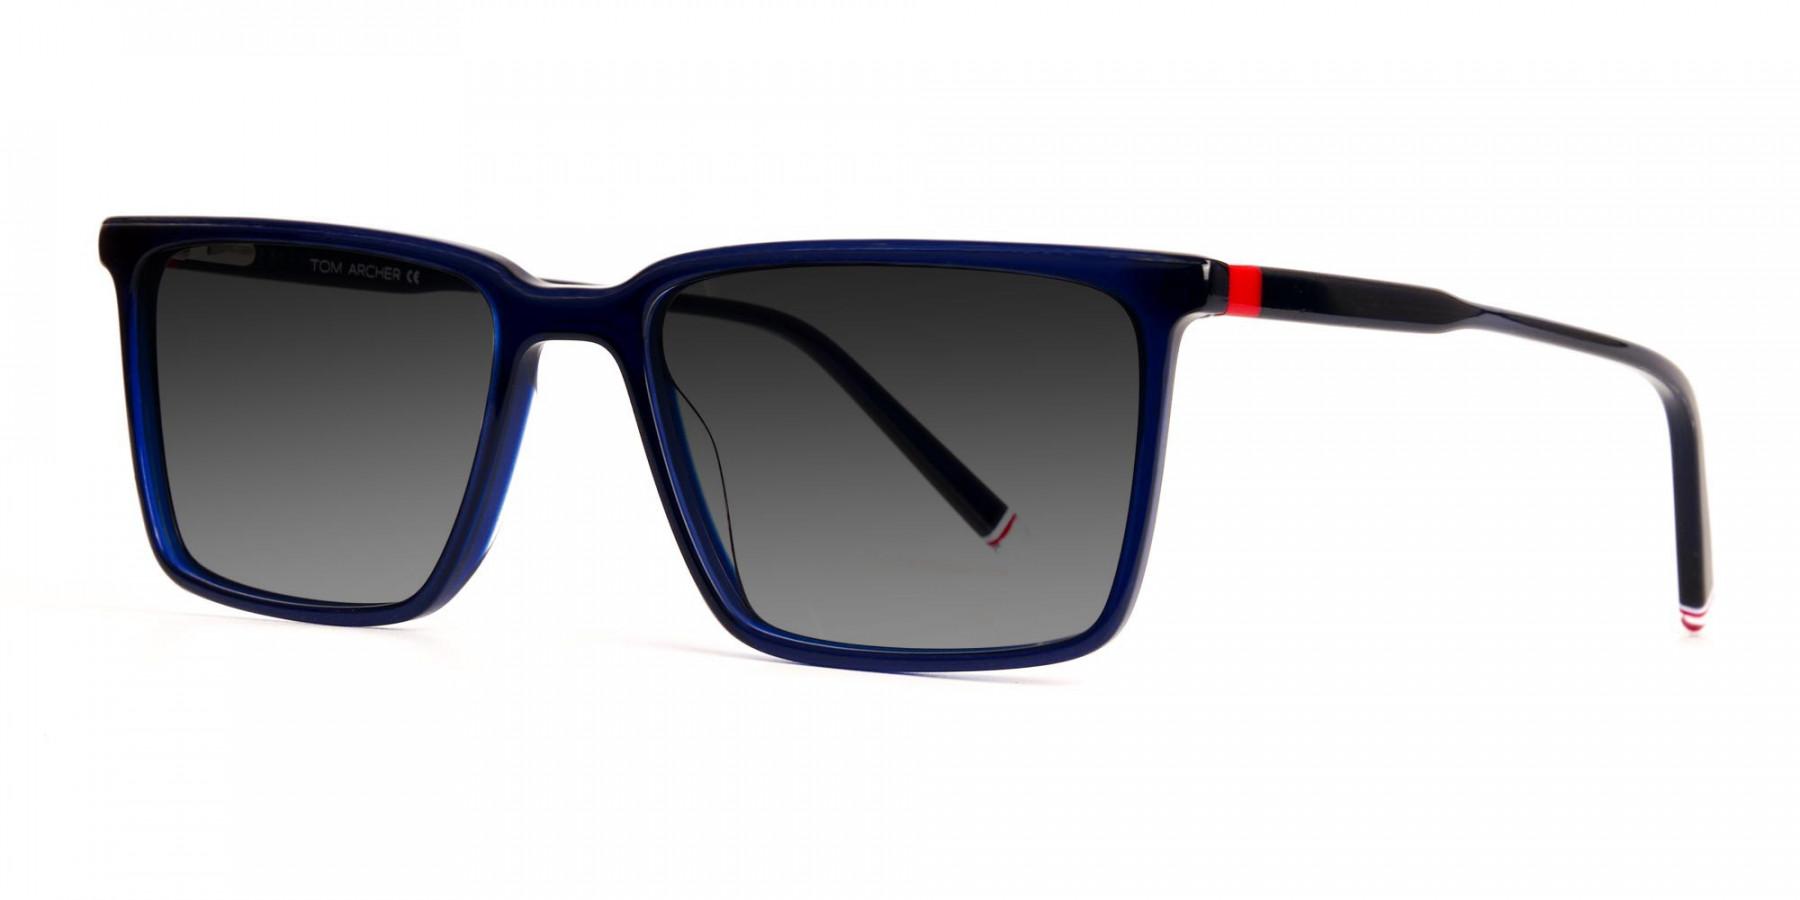 navy-blue-rectangular-full-rim-grey-tinted-sunglasses-frames-3